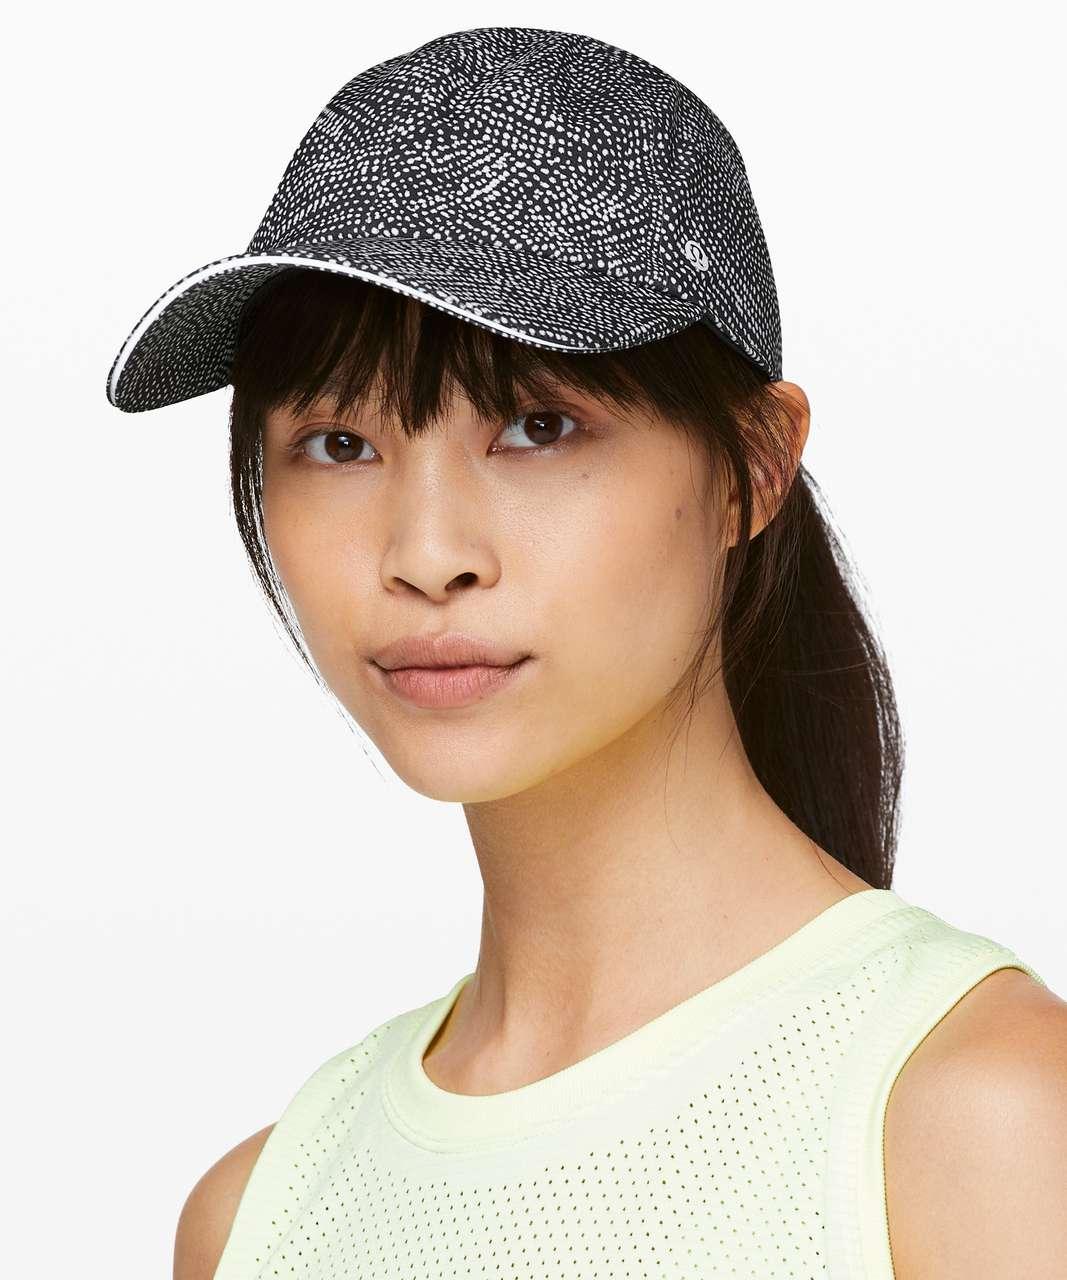 Lululemon Baller Hat Run - Free Spirit Alpine White Black